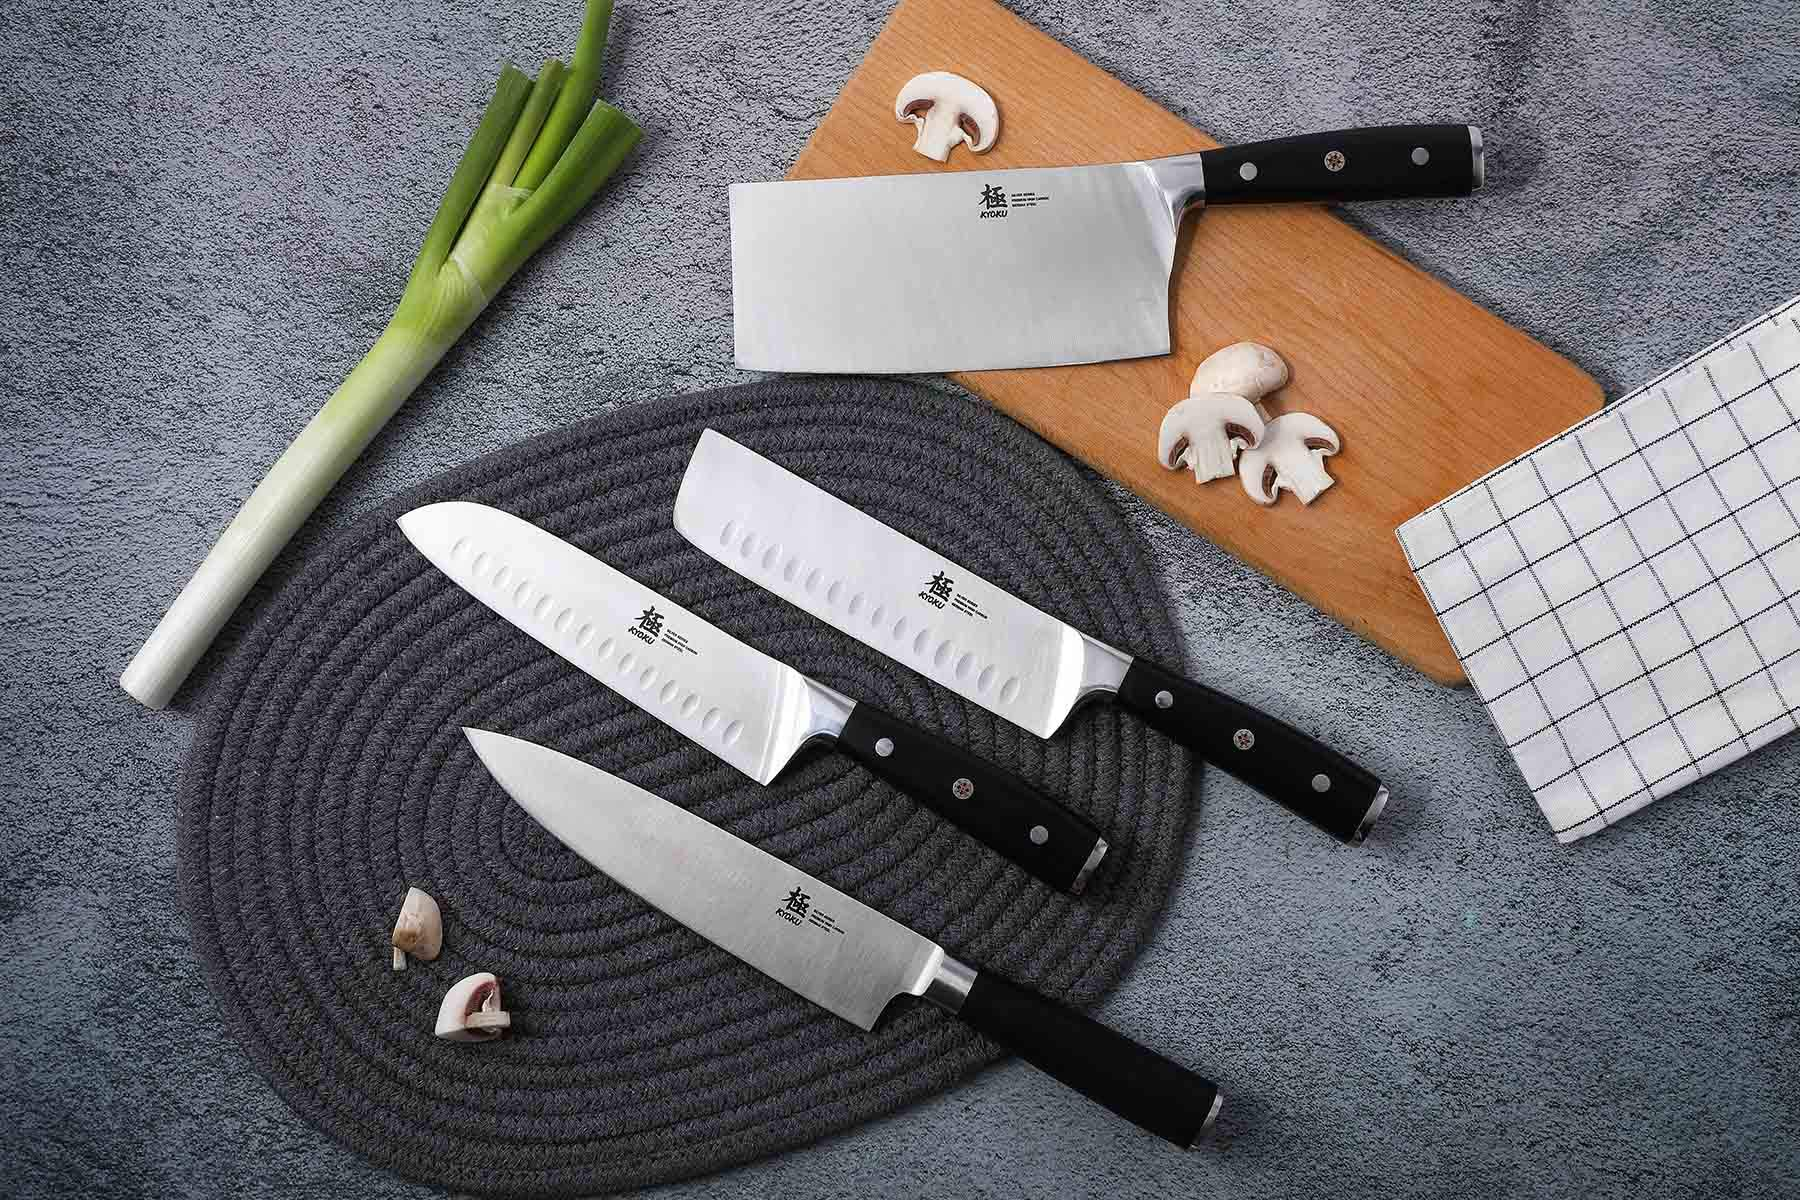 KYOKU Samurai Series - Nakiri Japanese Vegetable Knife 7'' with Sheath & Case - Full Tang - Japanese High Carbon Steel - Pakkawood Handle with Mosaic Pin by KYOKU (Image #2)